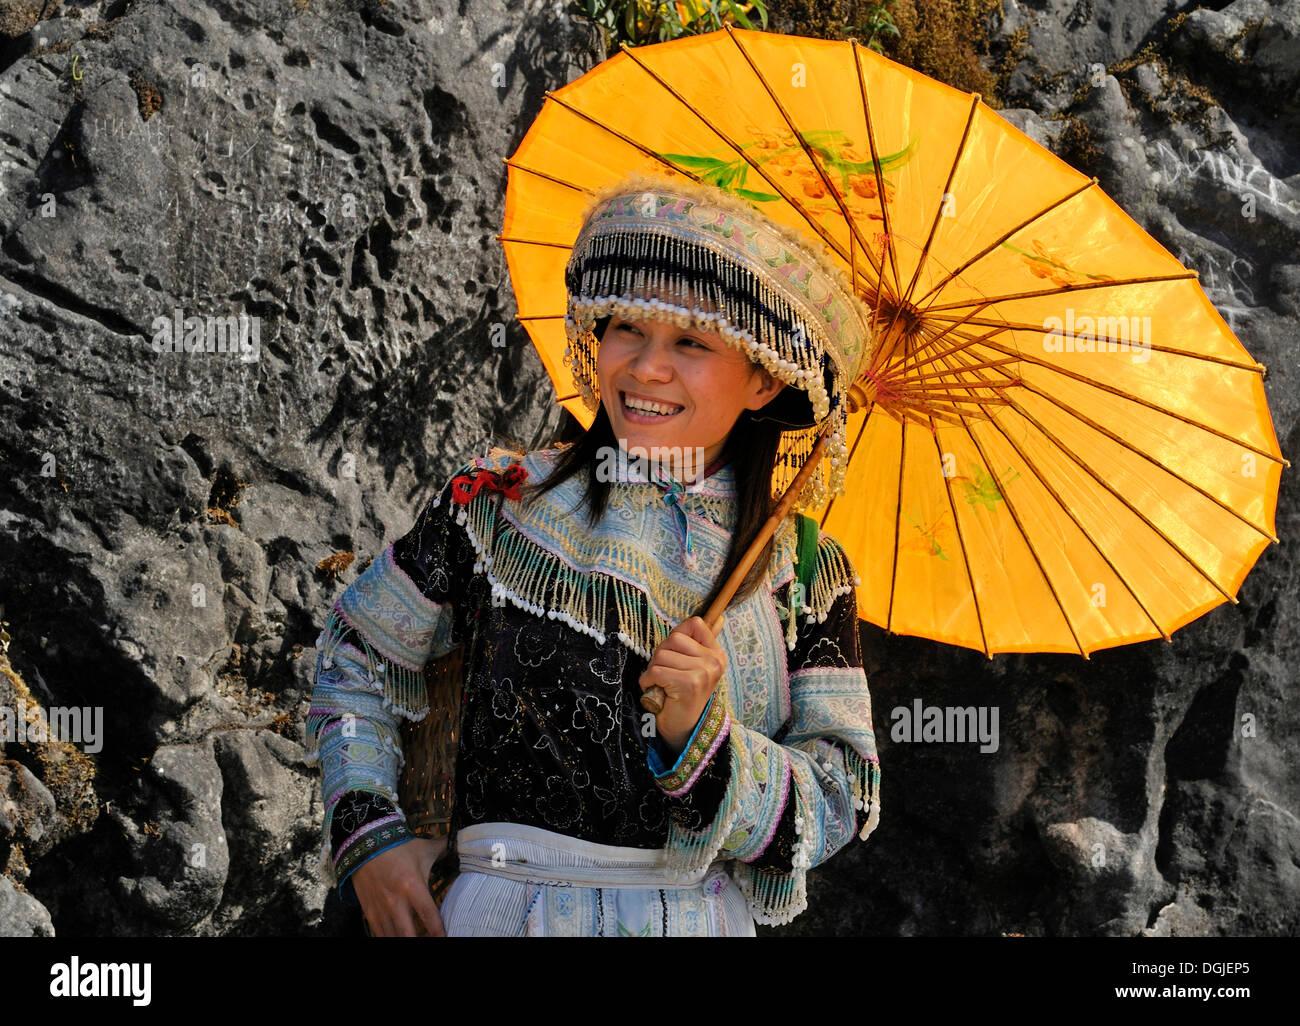 Tourist wearing a traditional costume, Sapa, Vietnam, Asia Stock Photo